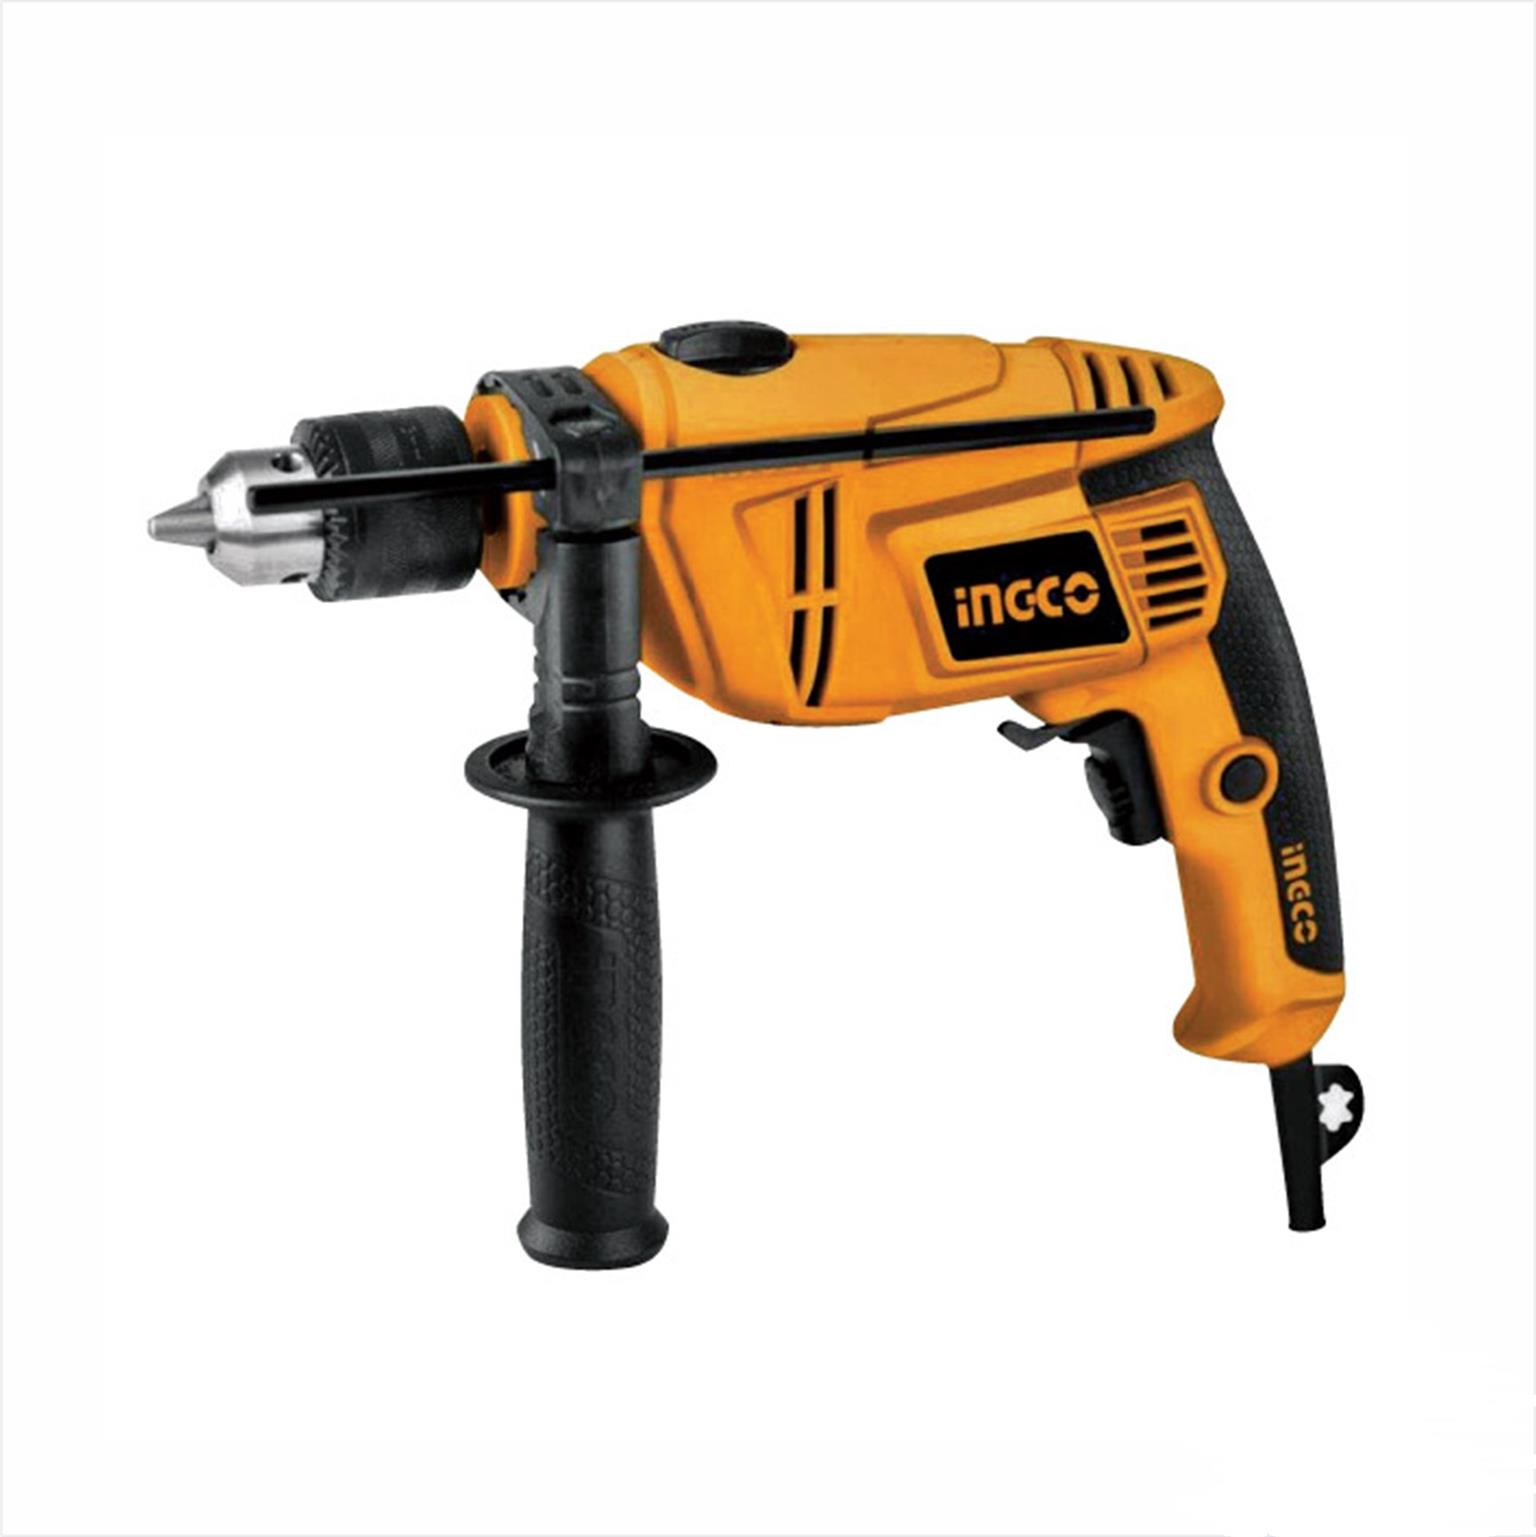 Ingco 650W Impact Drill